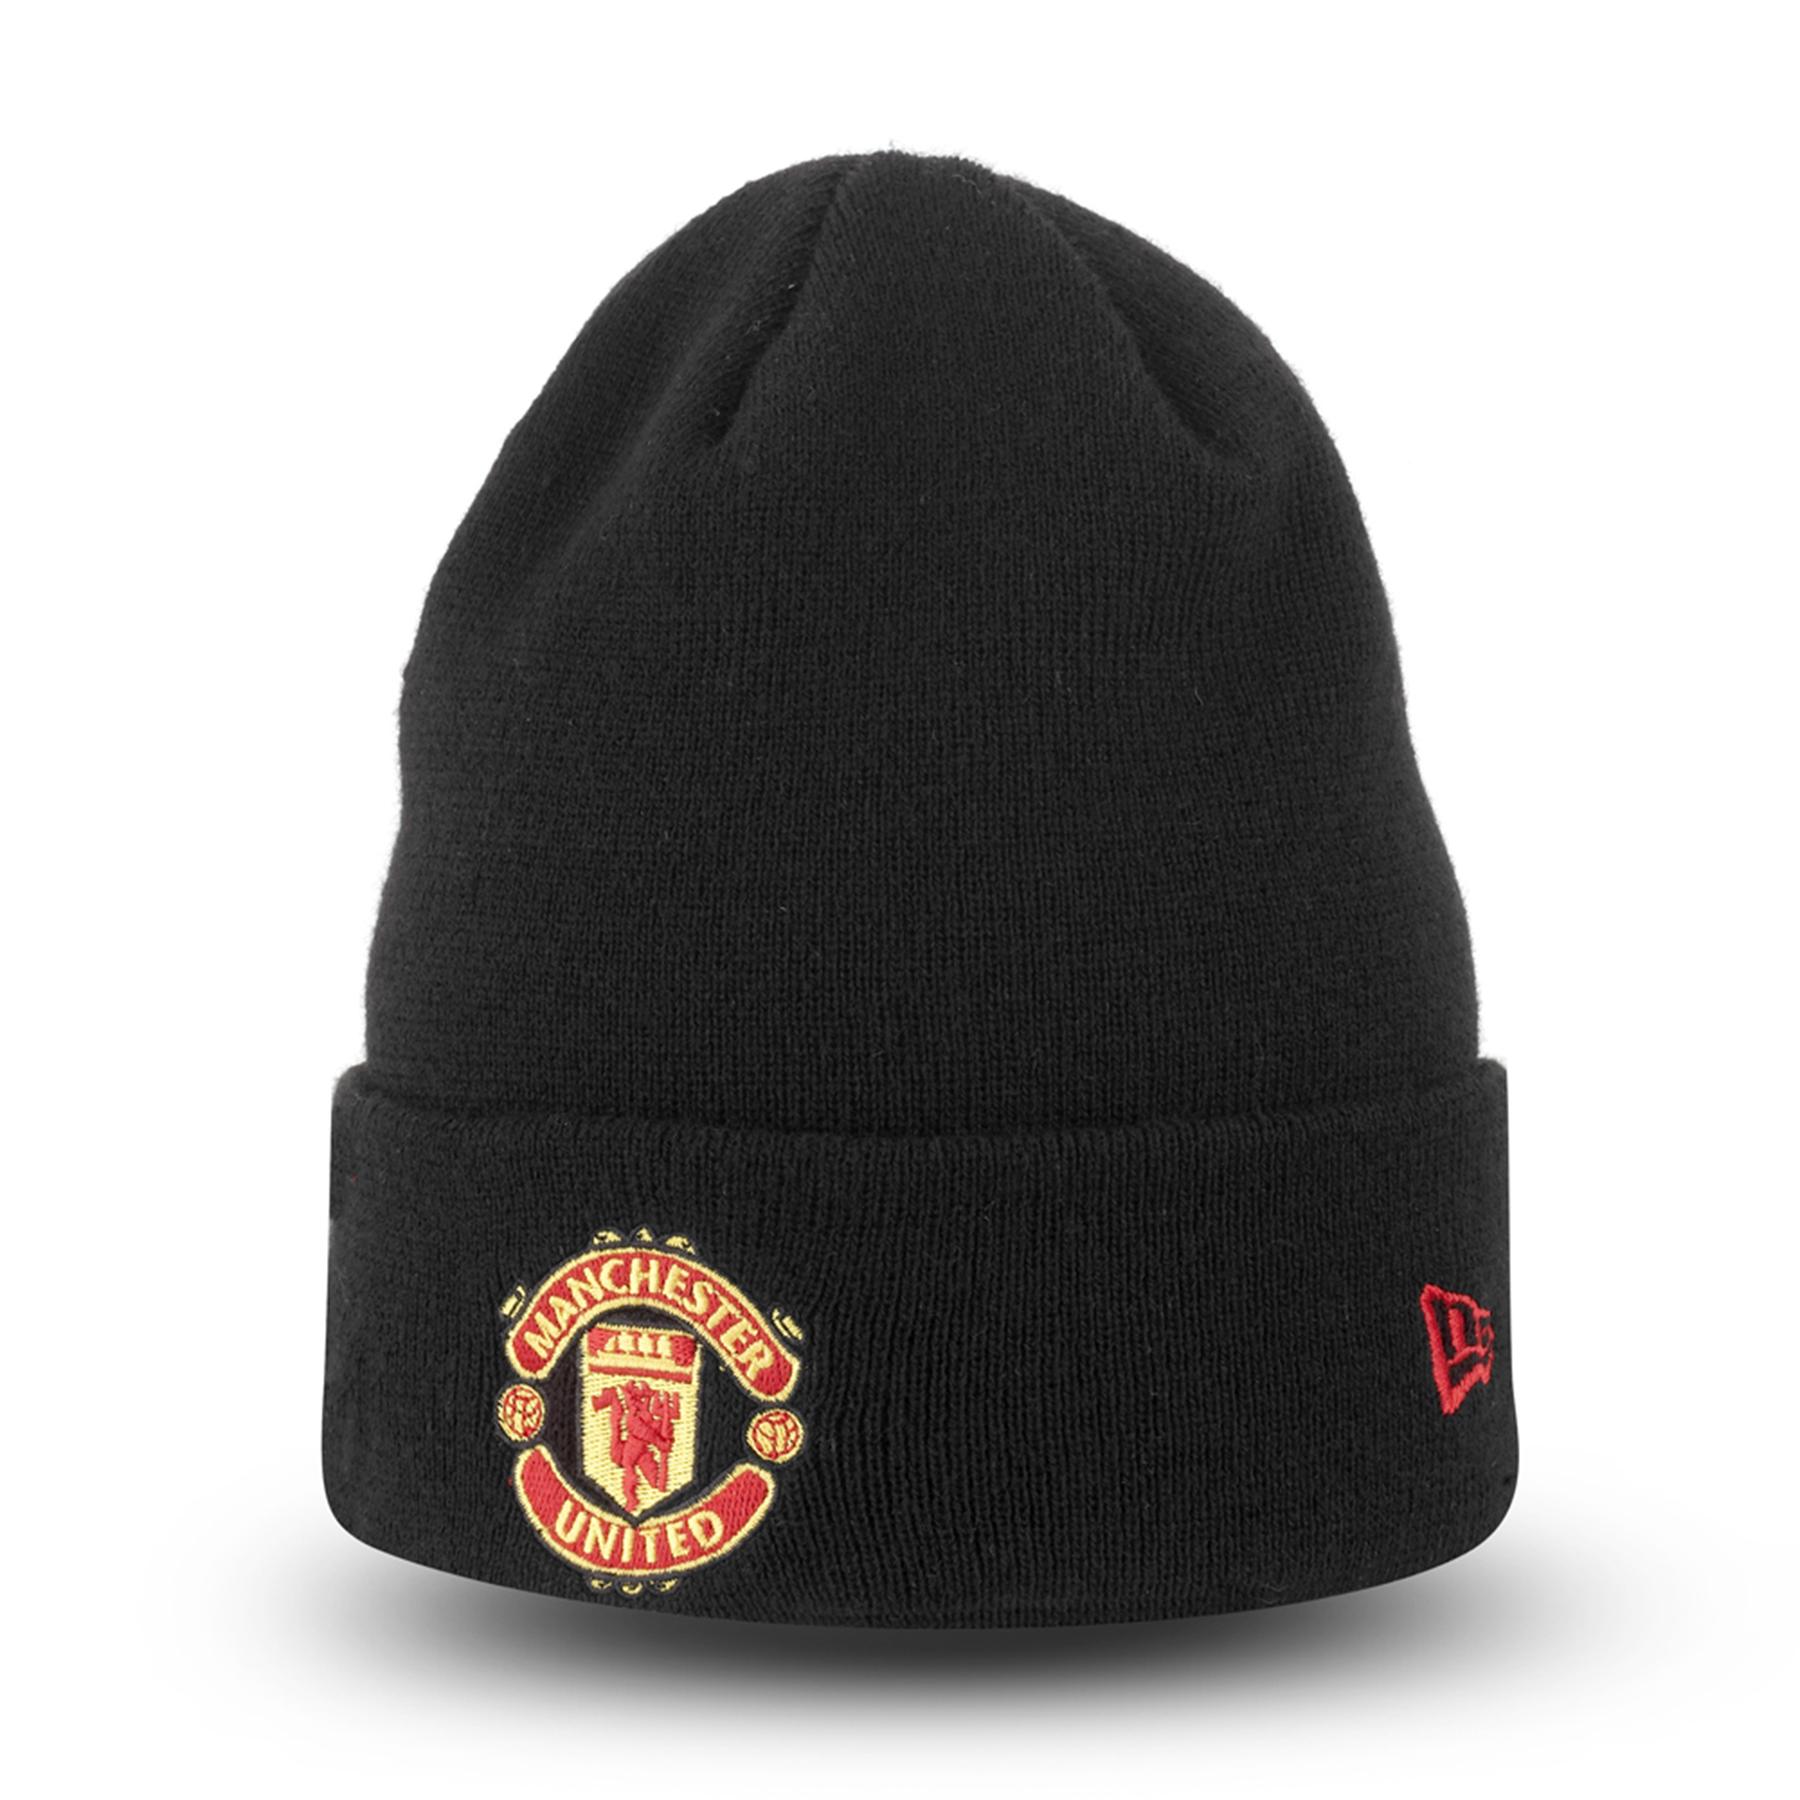 Manchester United New Era Basic Cuff Hat - Black - Adult